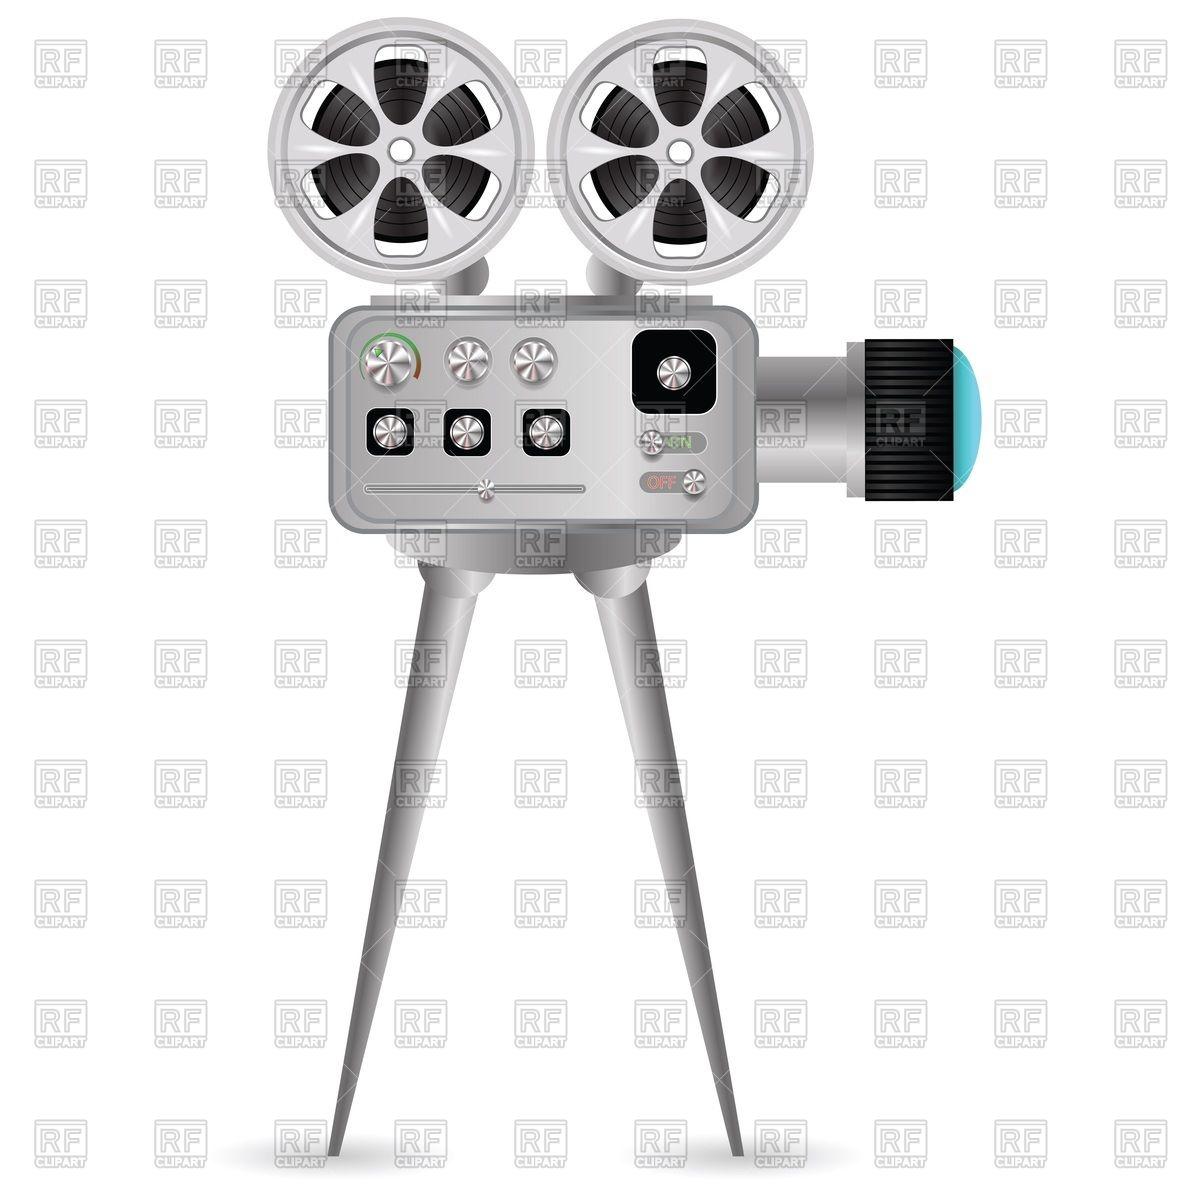 1200x1200 Movie Projector With Film Reel Vector Image Vector Artwork Of